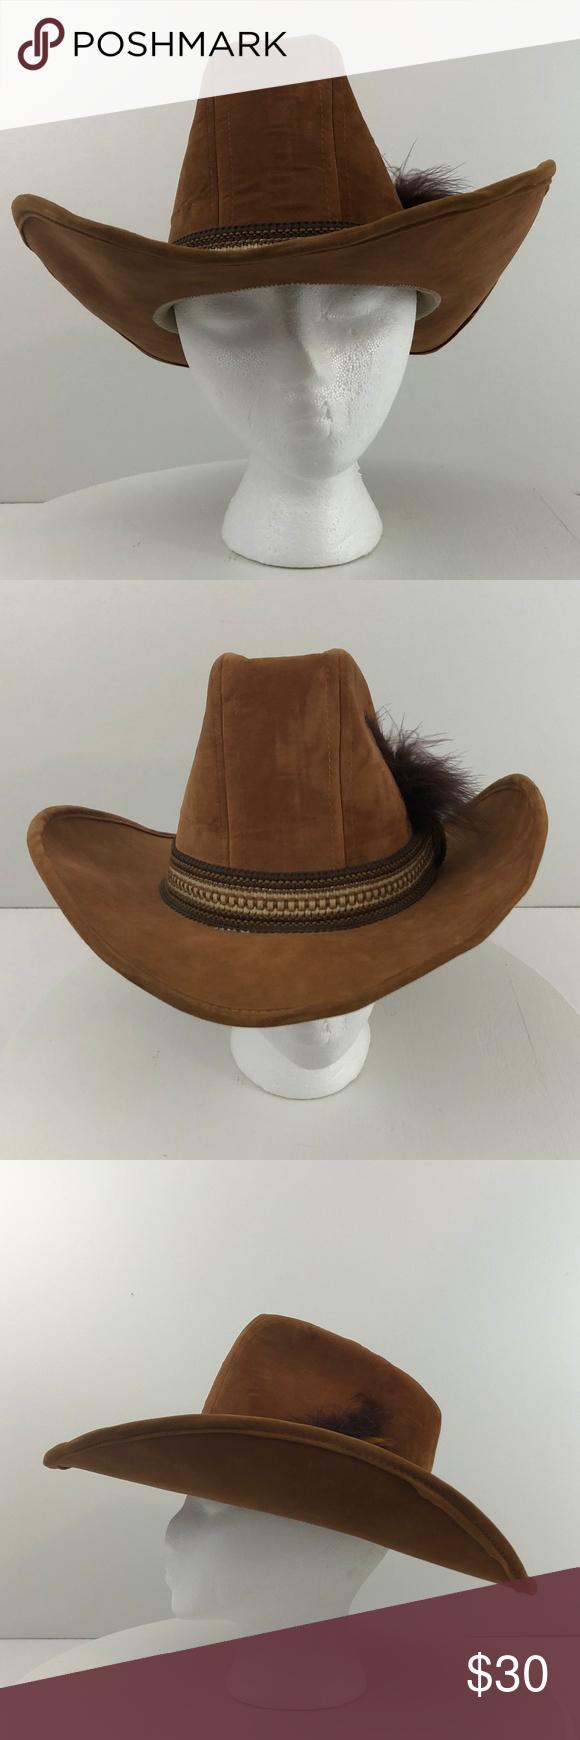 Vintage Union Made Suede Cowboy Hat Vintage United Hatters Cap and  Millinery Union Suede Men Cowboy Hat Size Medium Brand  United Hatters Cap    Millinery ... 78ec076a3450